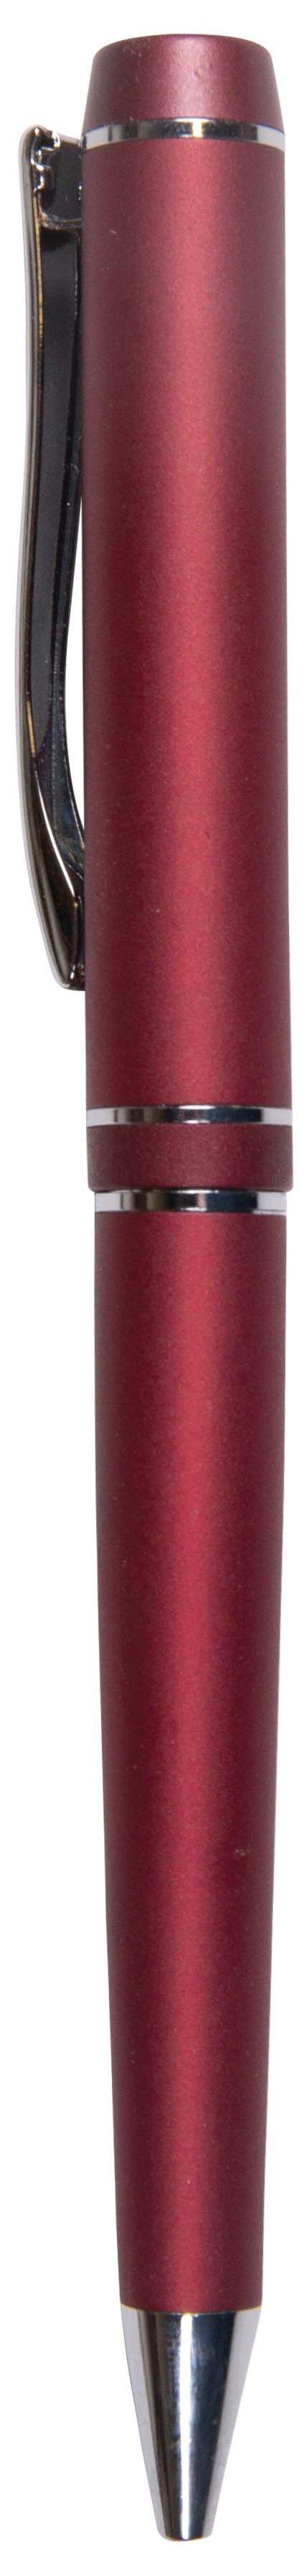 Metal Pen 4